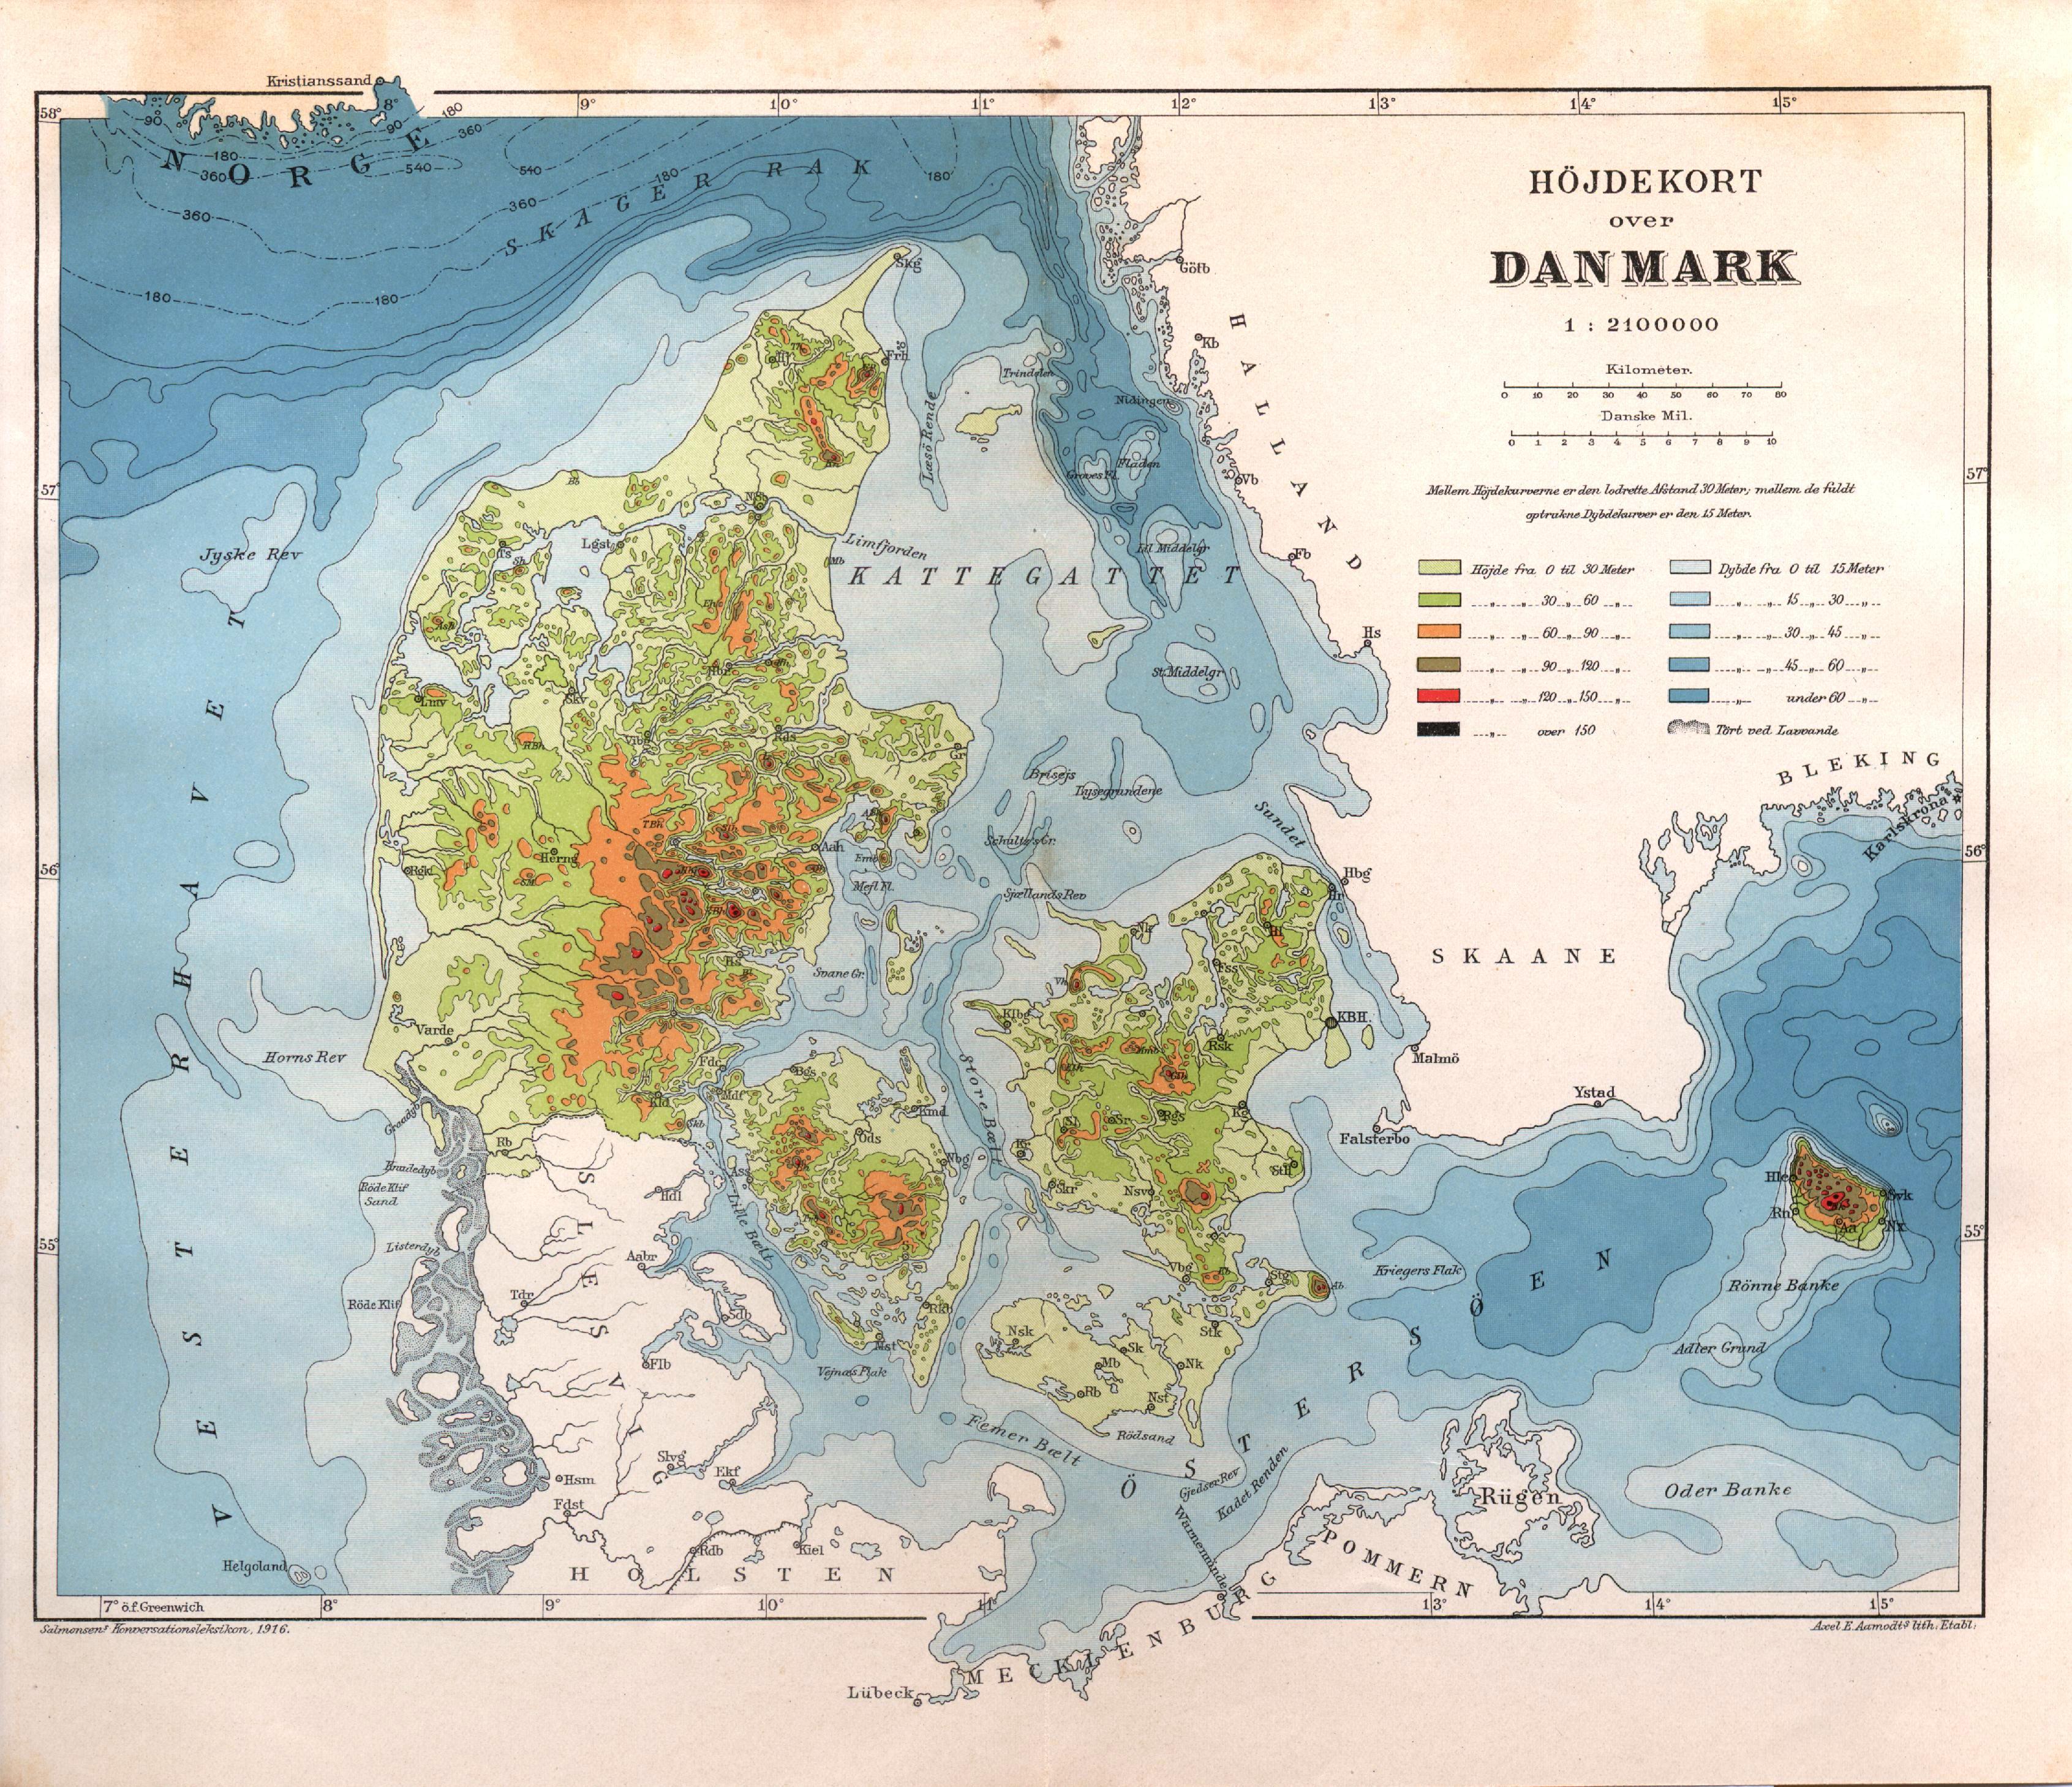 Hojdekort Over Danmark Salmonsens Konversationsleksikon Anden